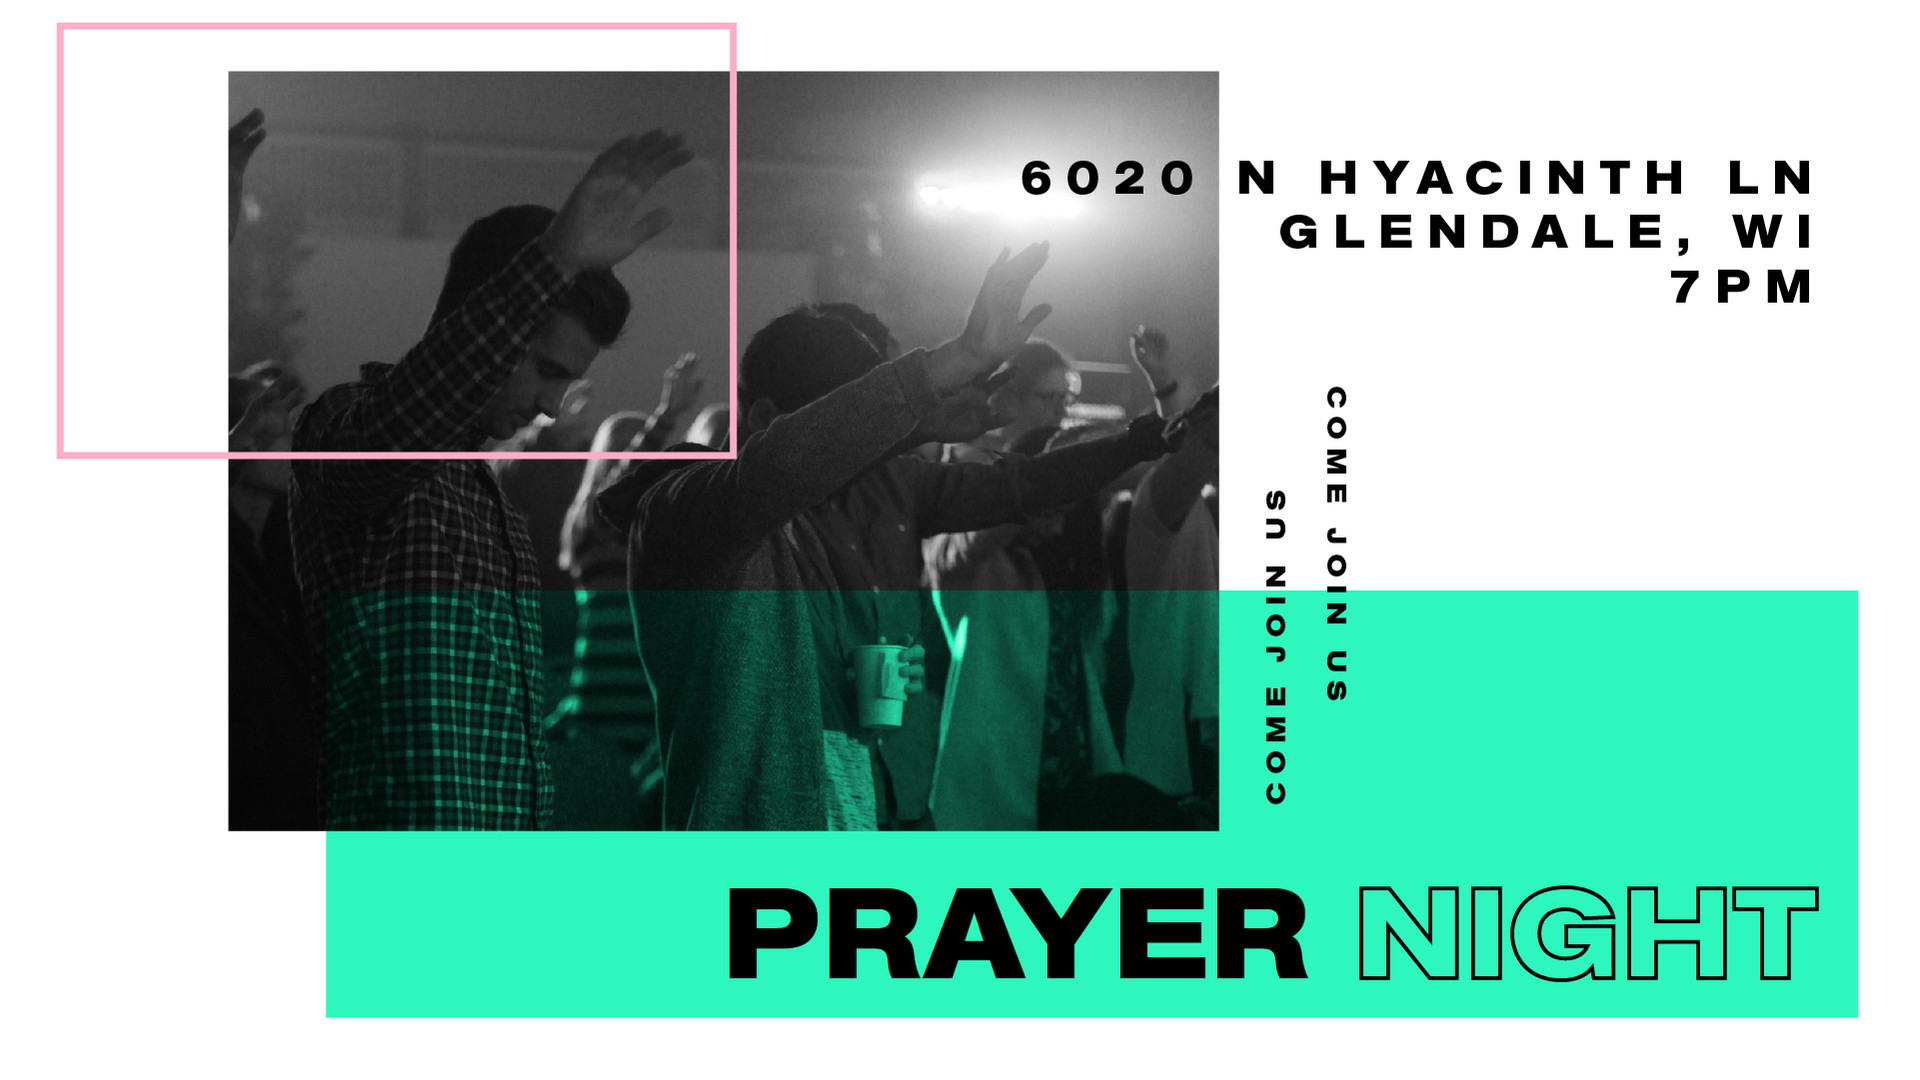 Szn2_PrayerNight_Screen.jpg